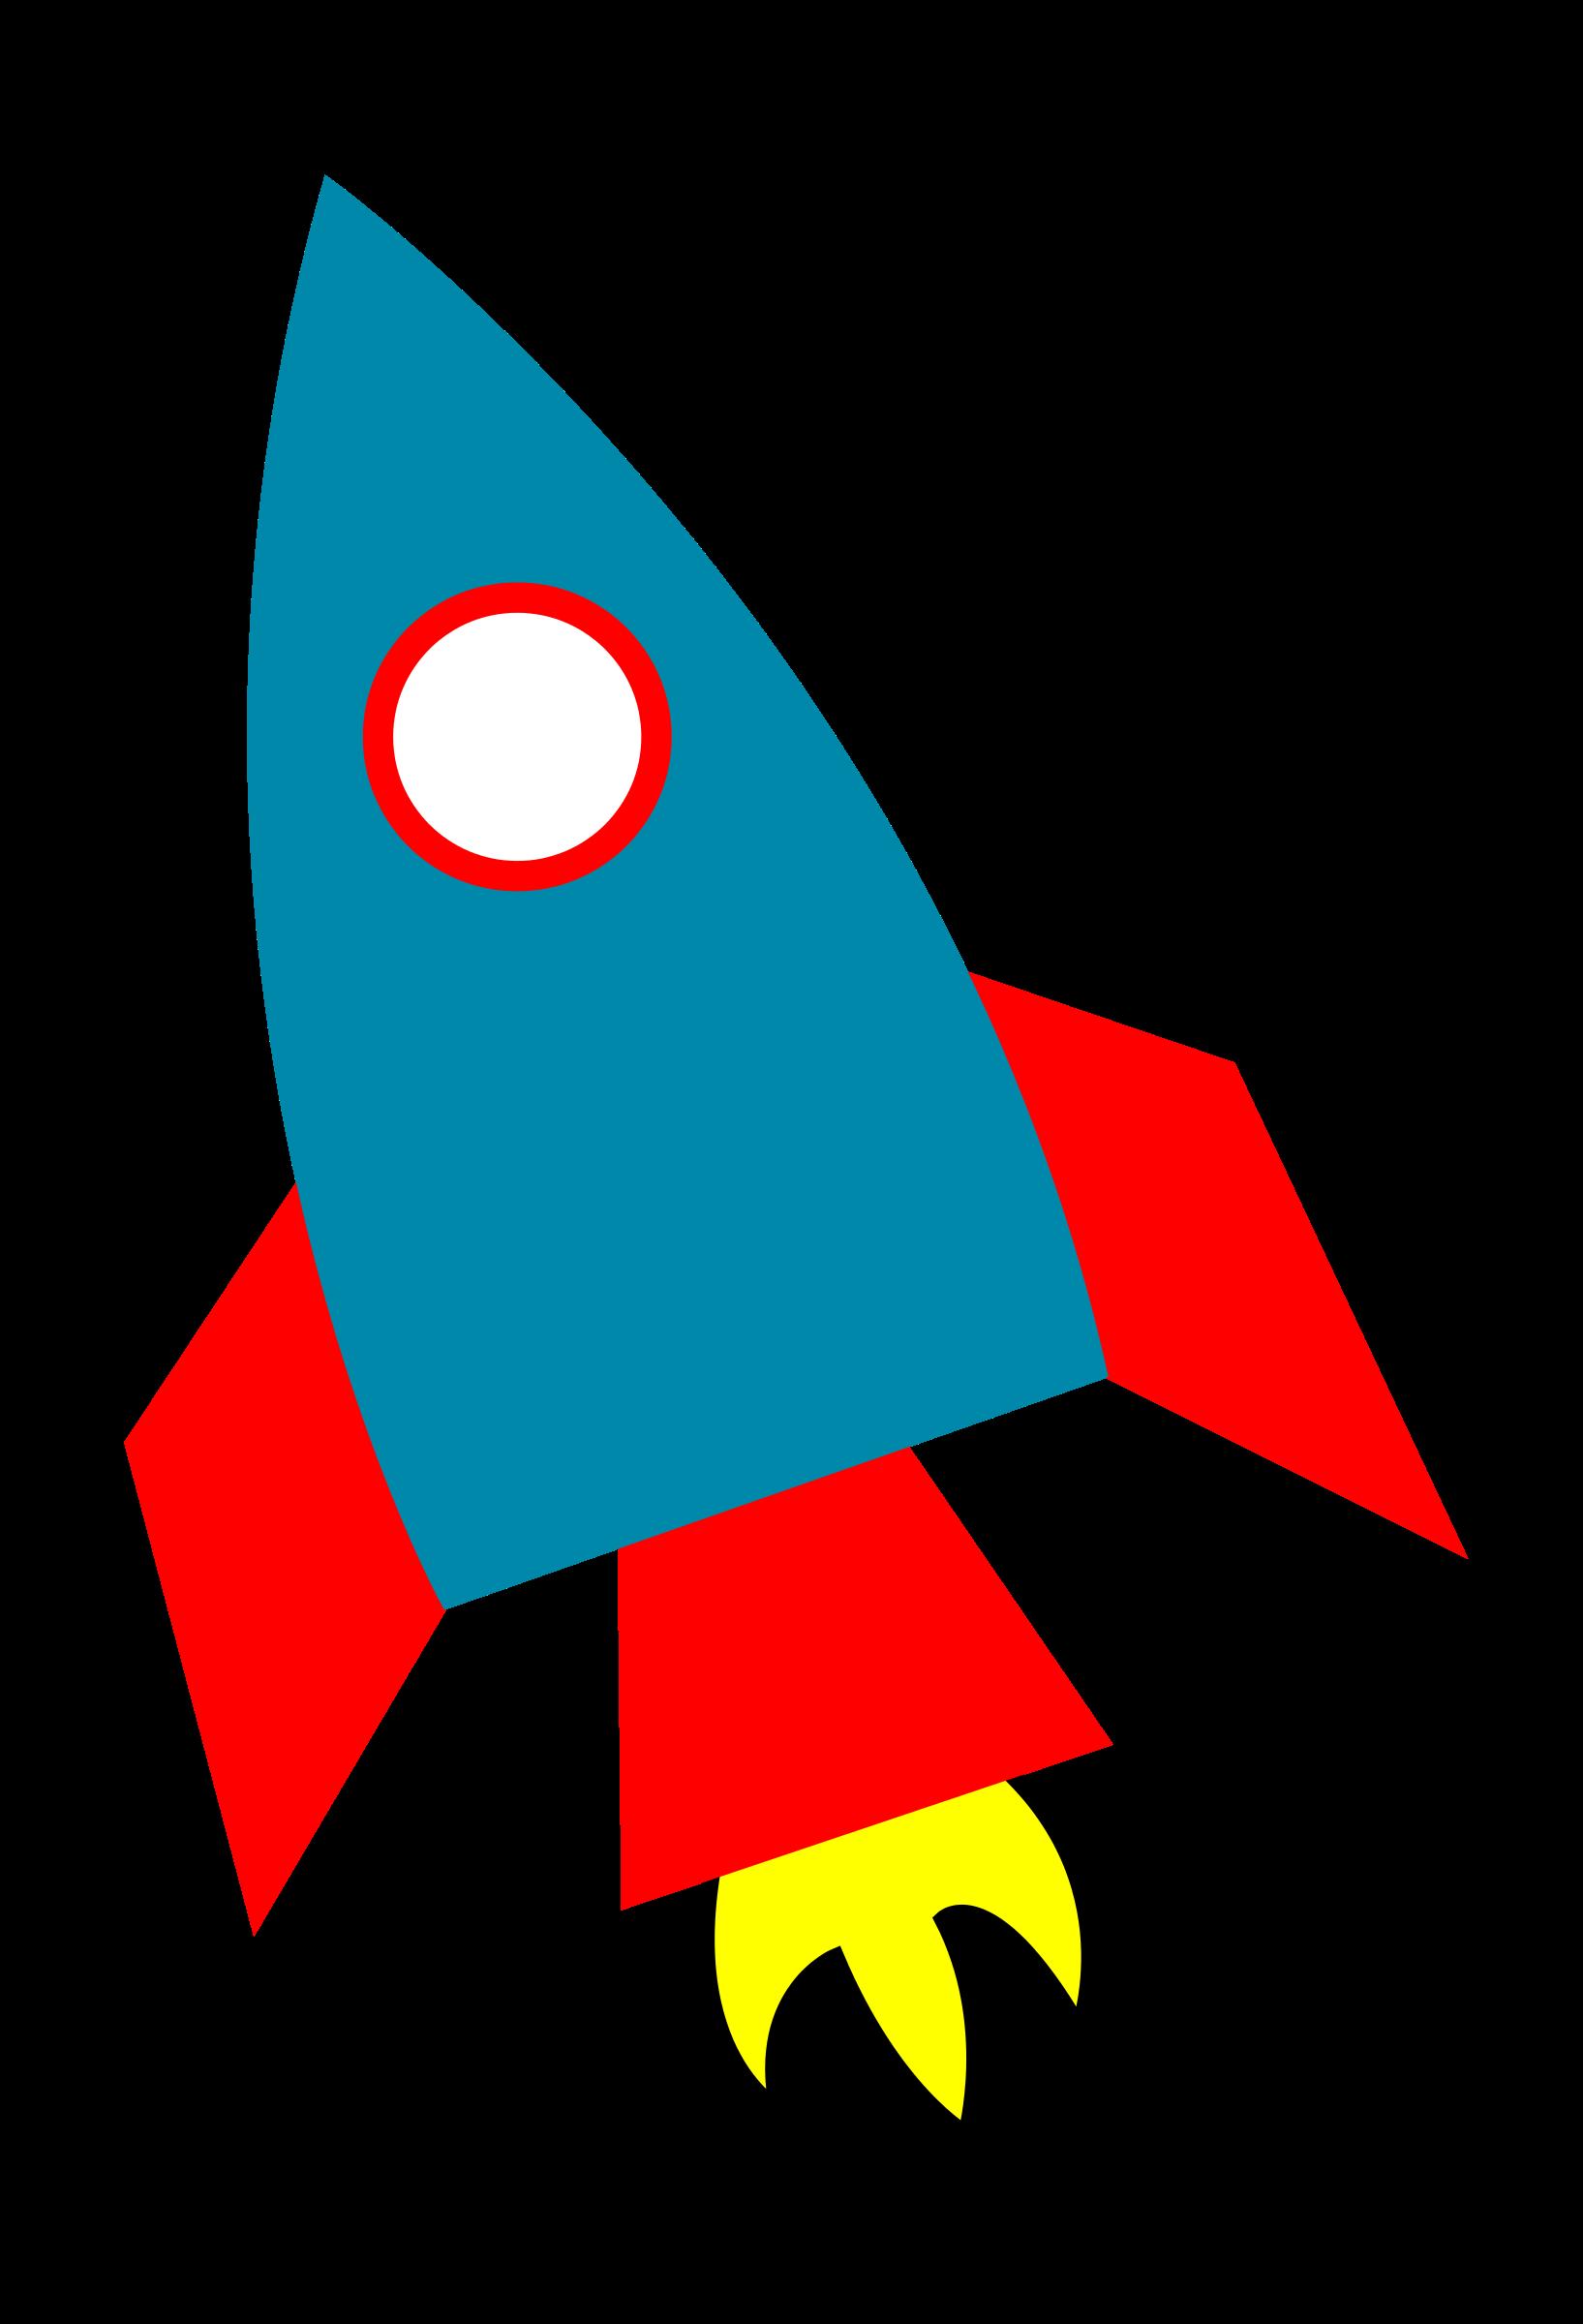 PNG HD Of Rockets - 123680